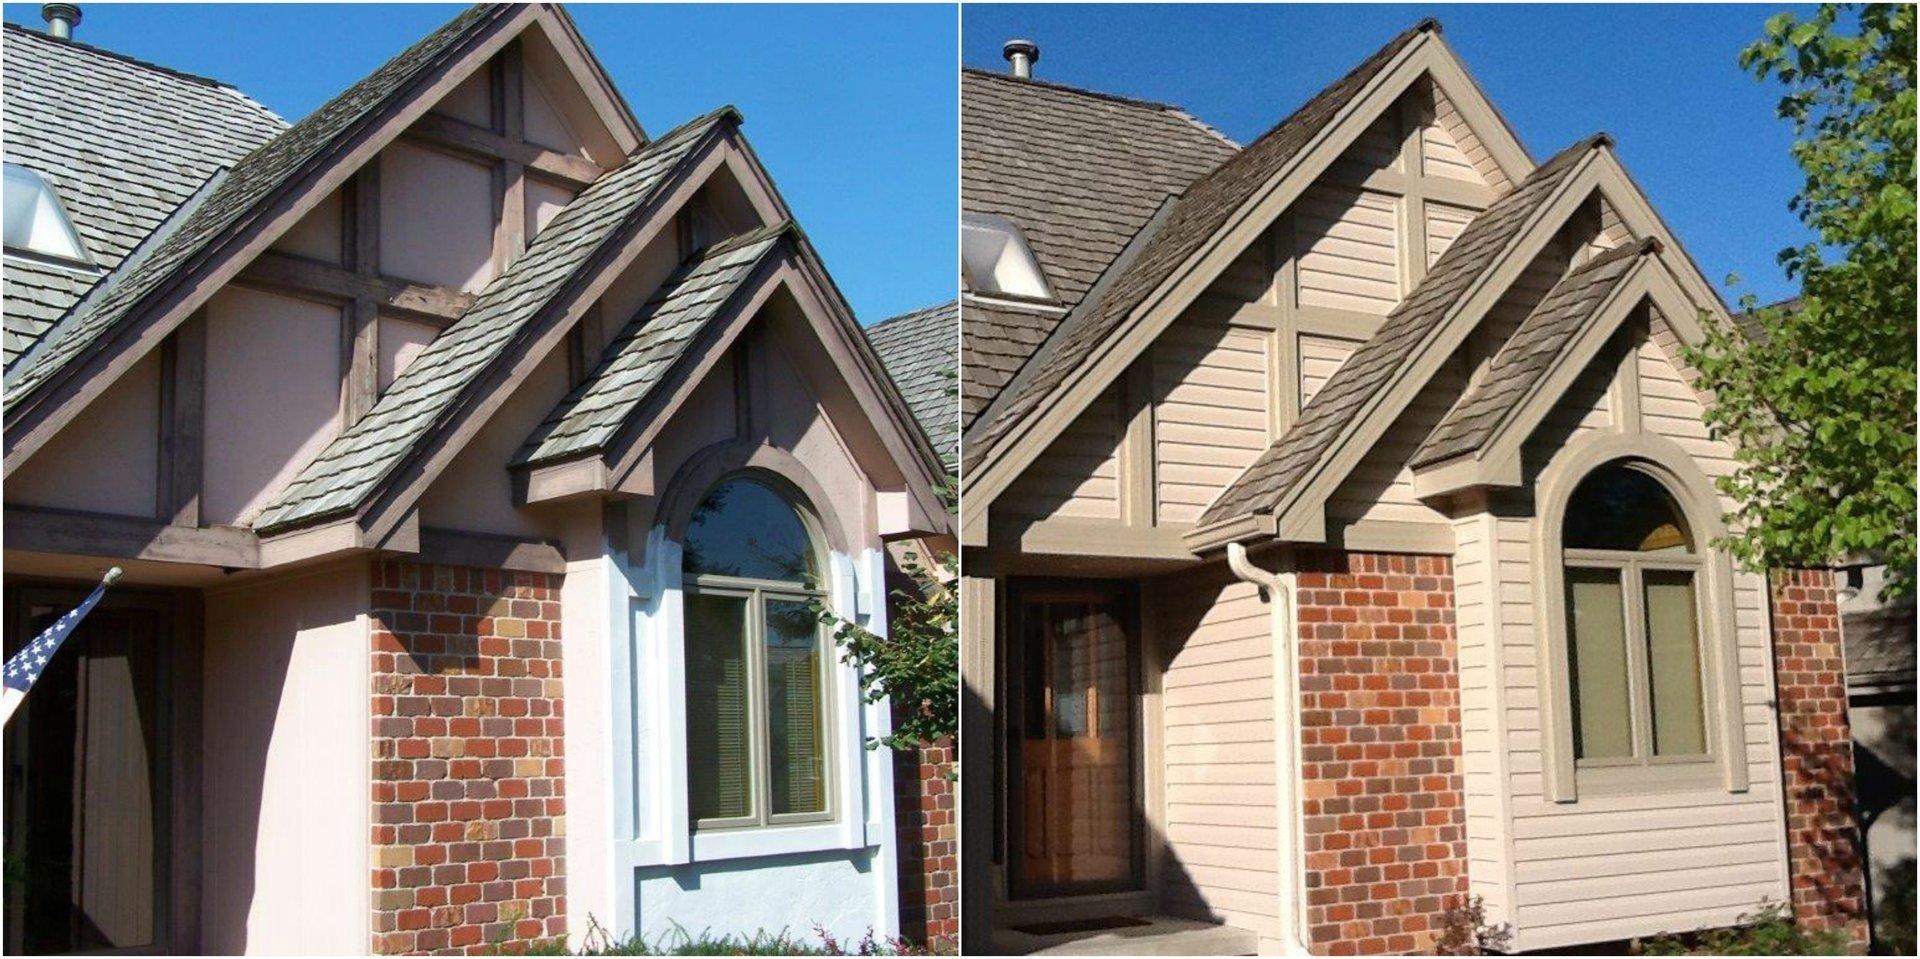 Monarch Siding, Windows & Roofing Inc image 5